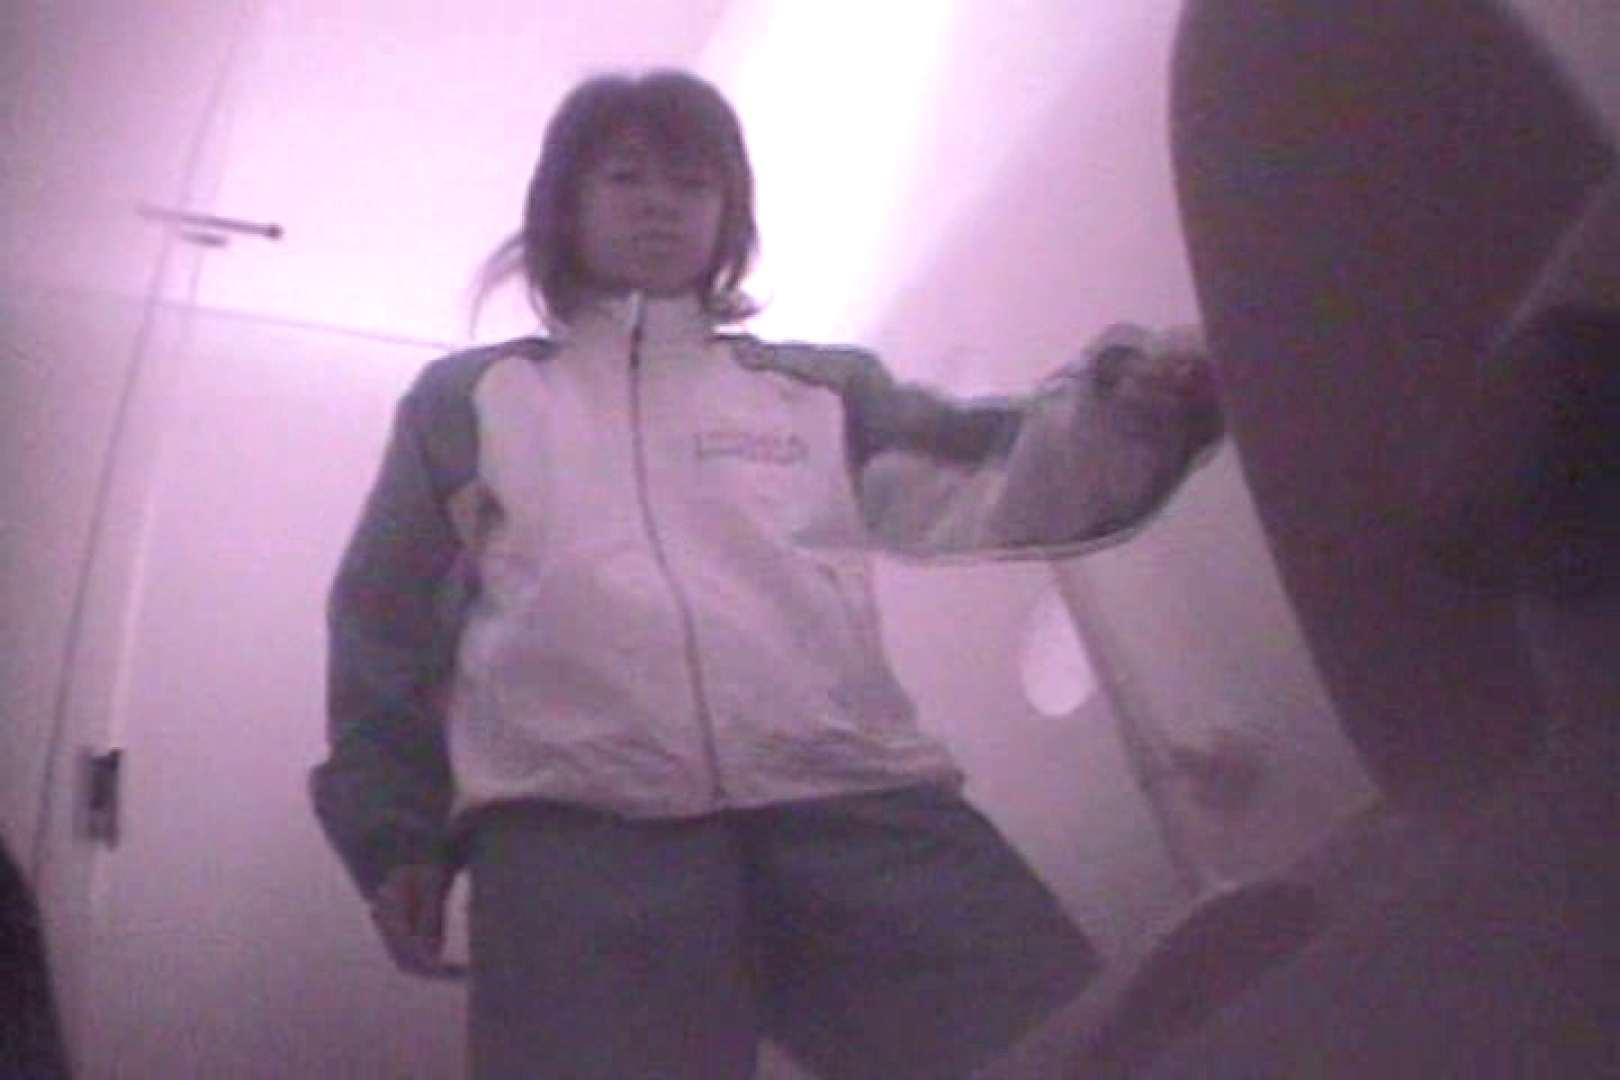 陸上部洗面所Vol.3 細身 AV無料動画キャプチャ 99画像 11